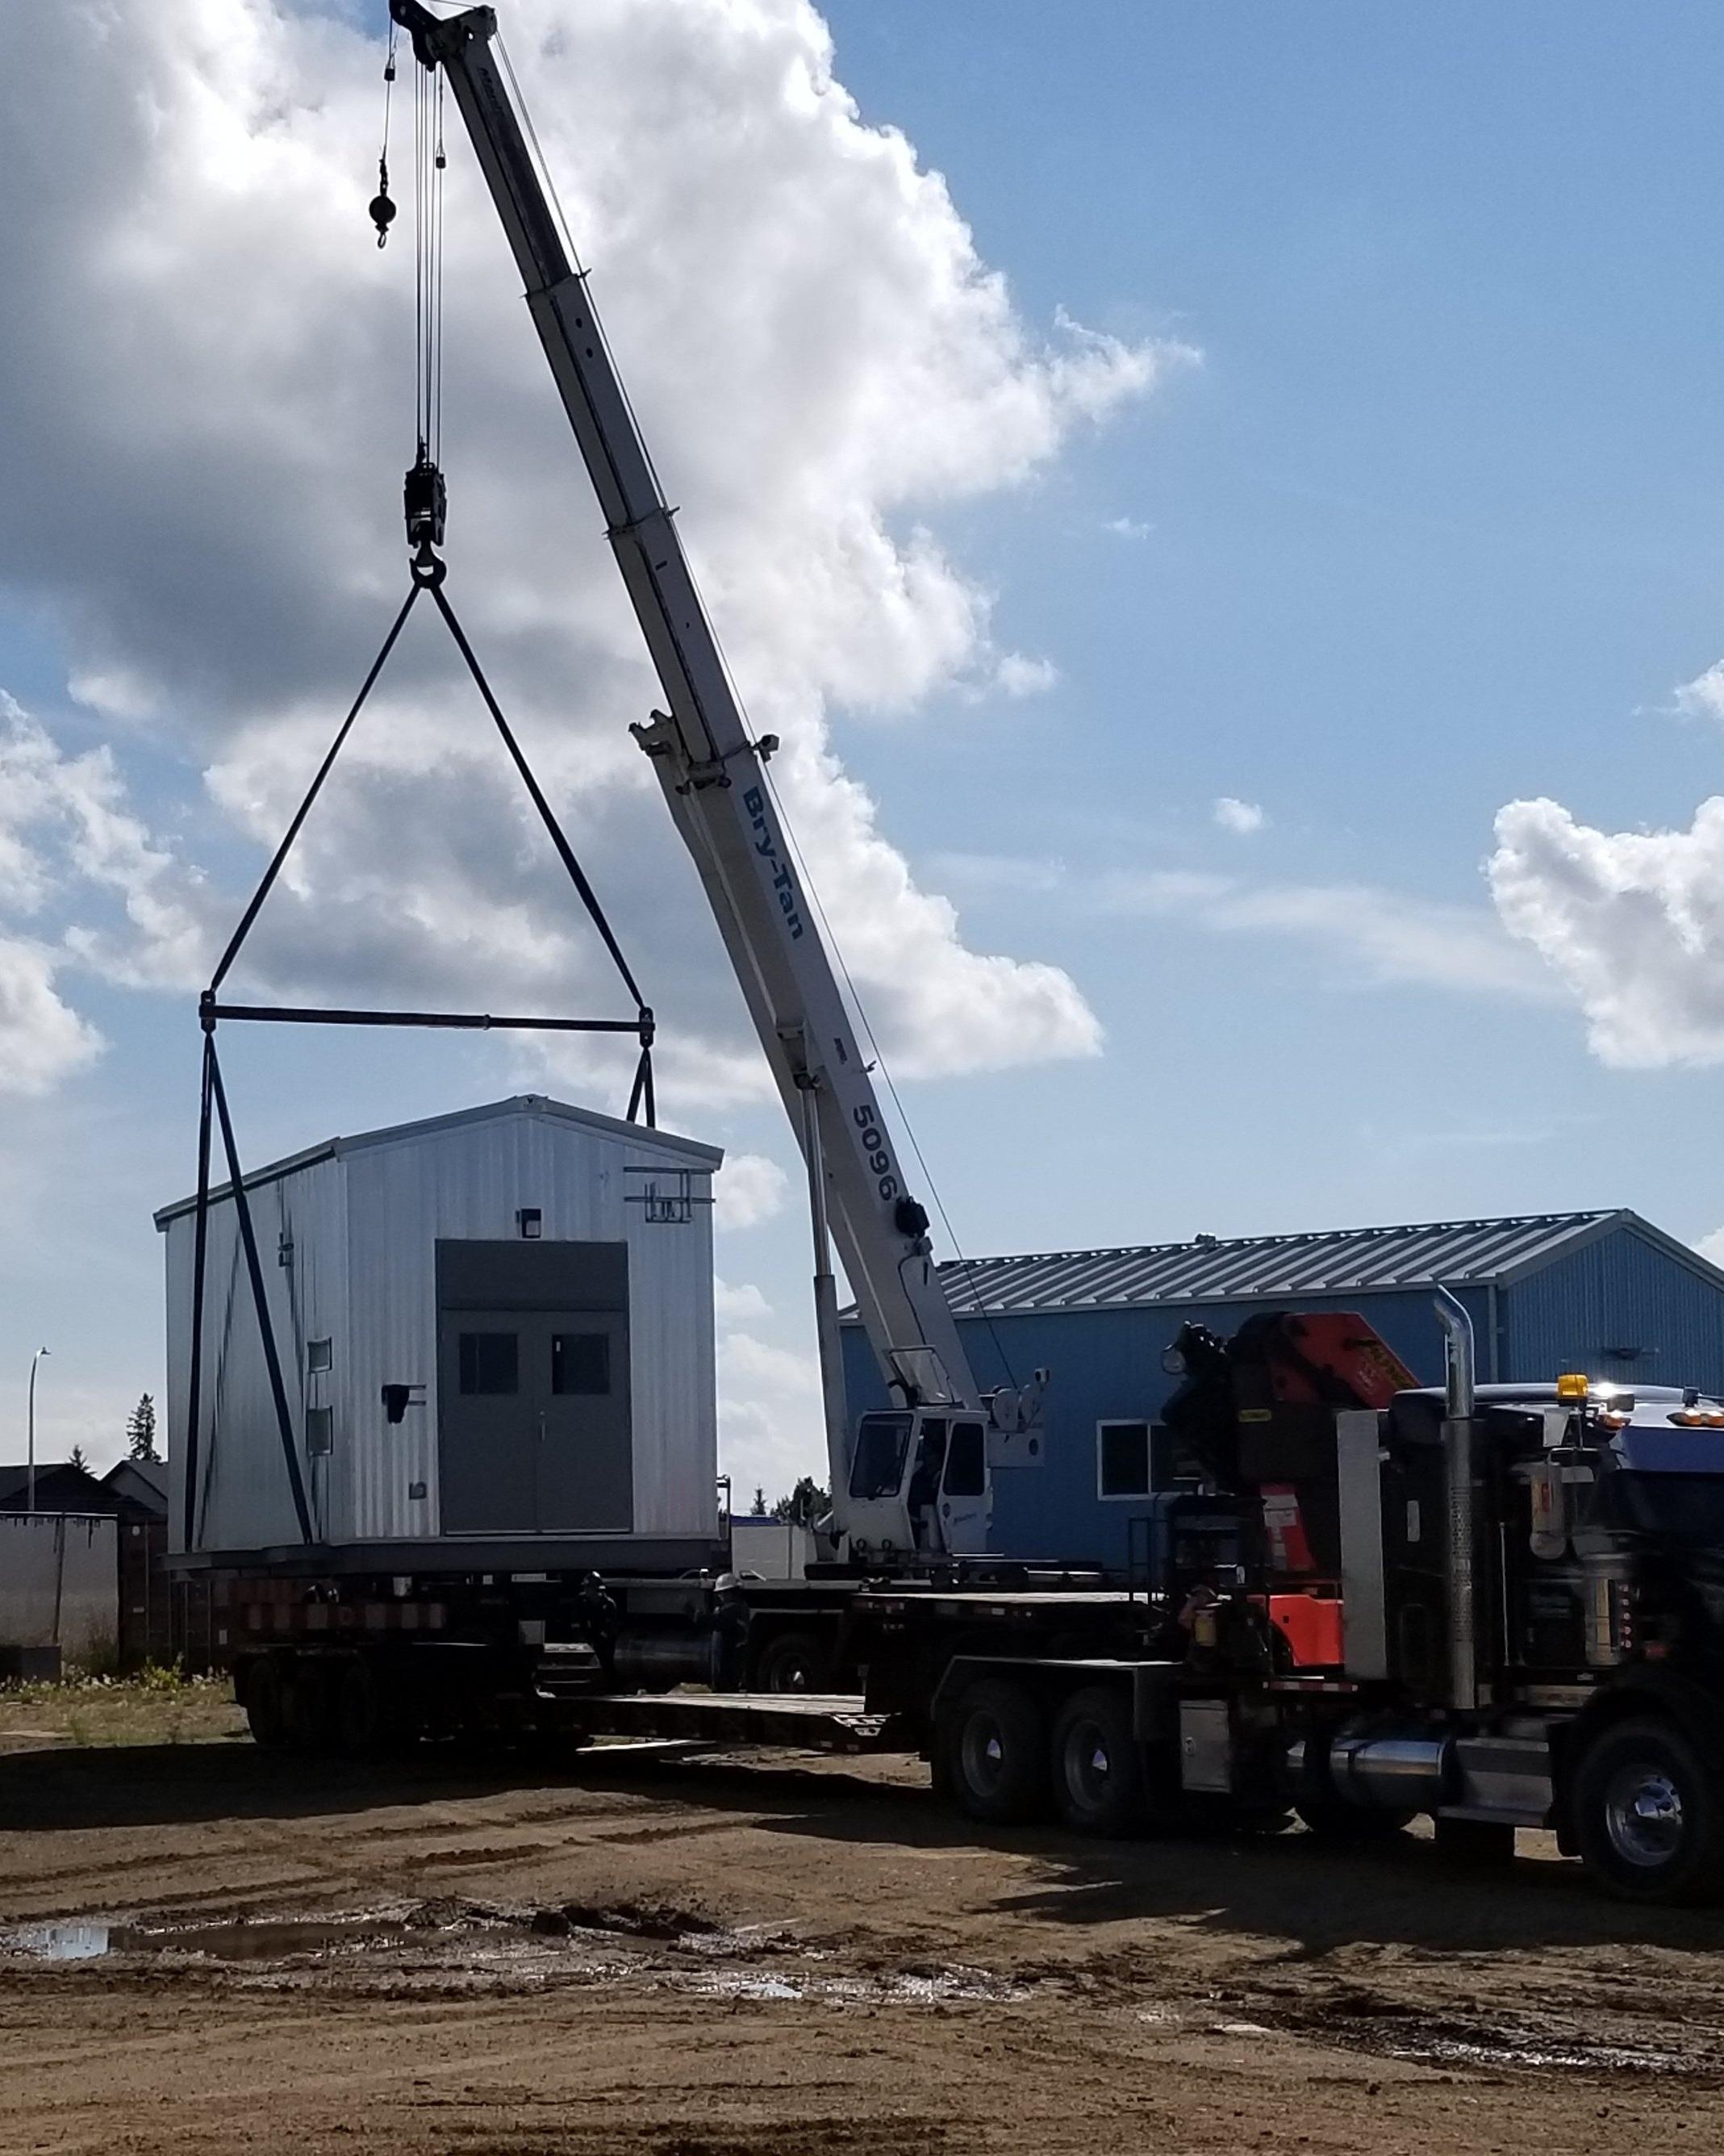 2019 - 50 ton - load metal building at vertex